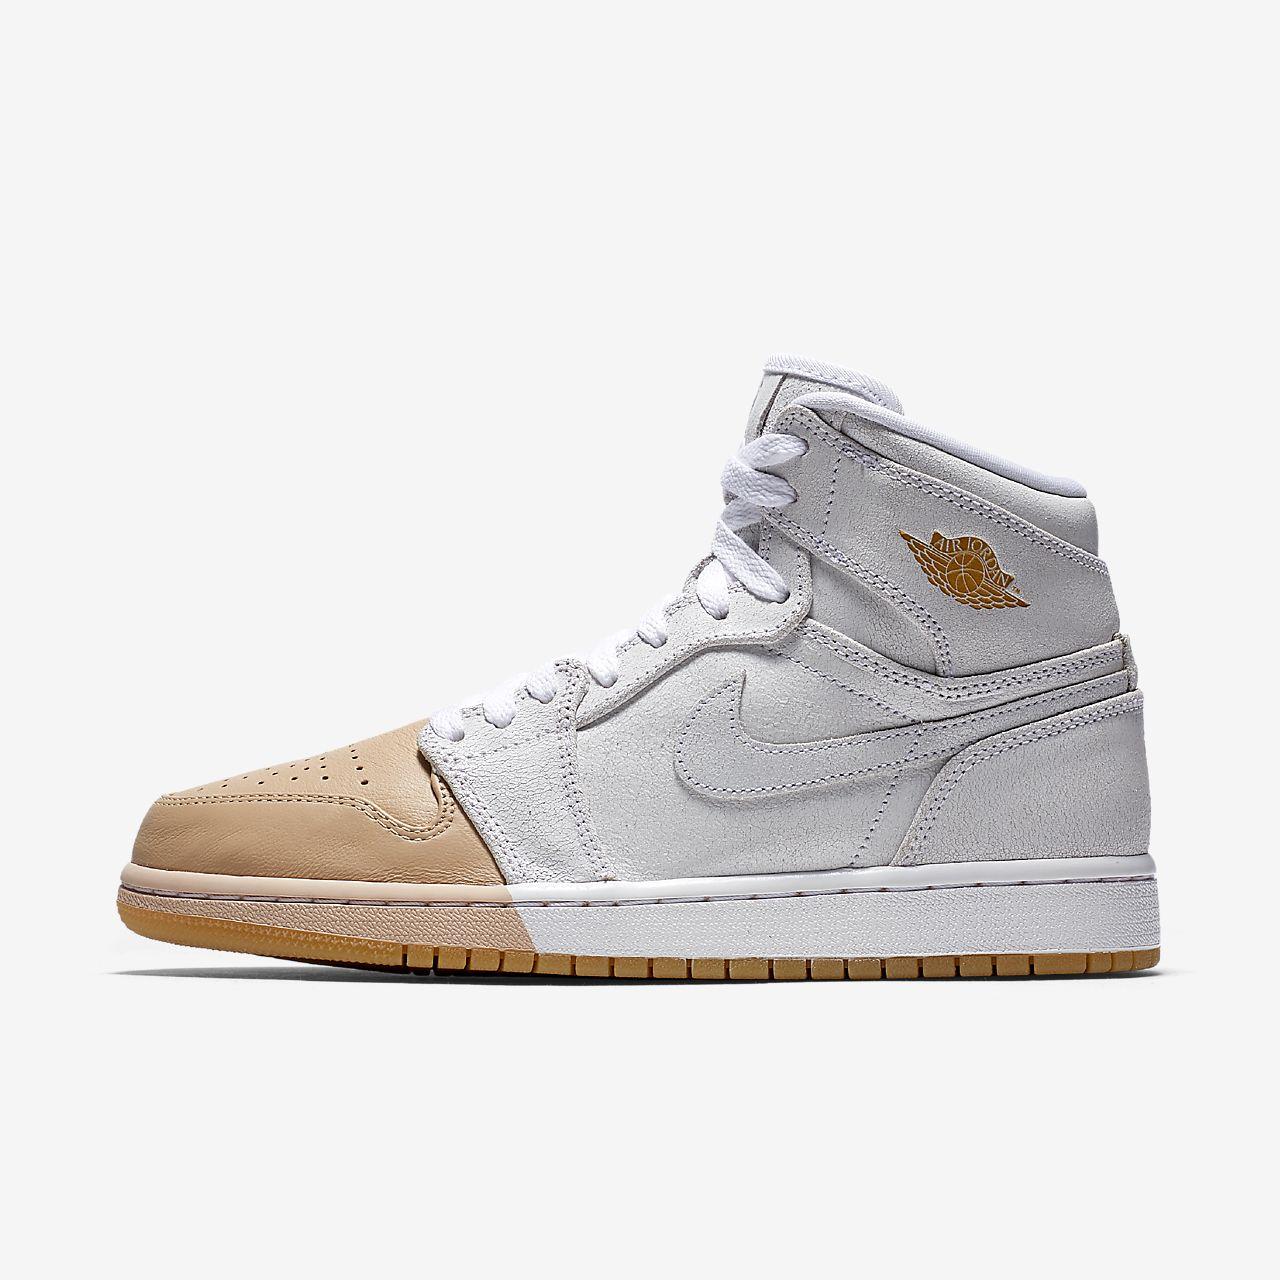 on sale ebdb6 79872 ... Nike Air Jordan 1 Retro High Premium Damenschuh